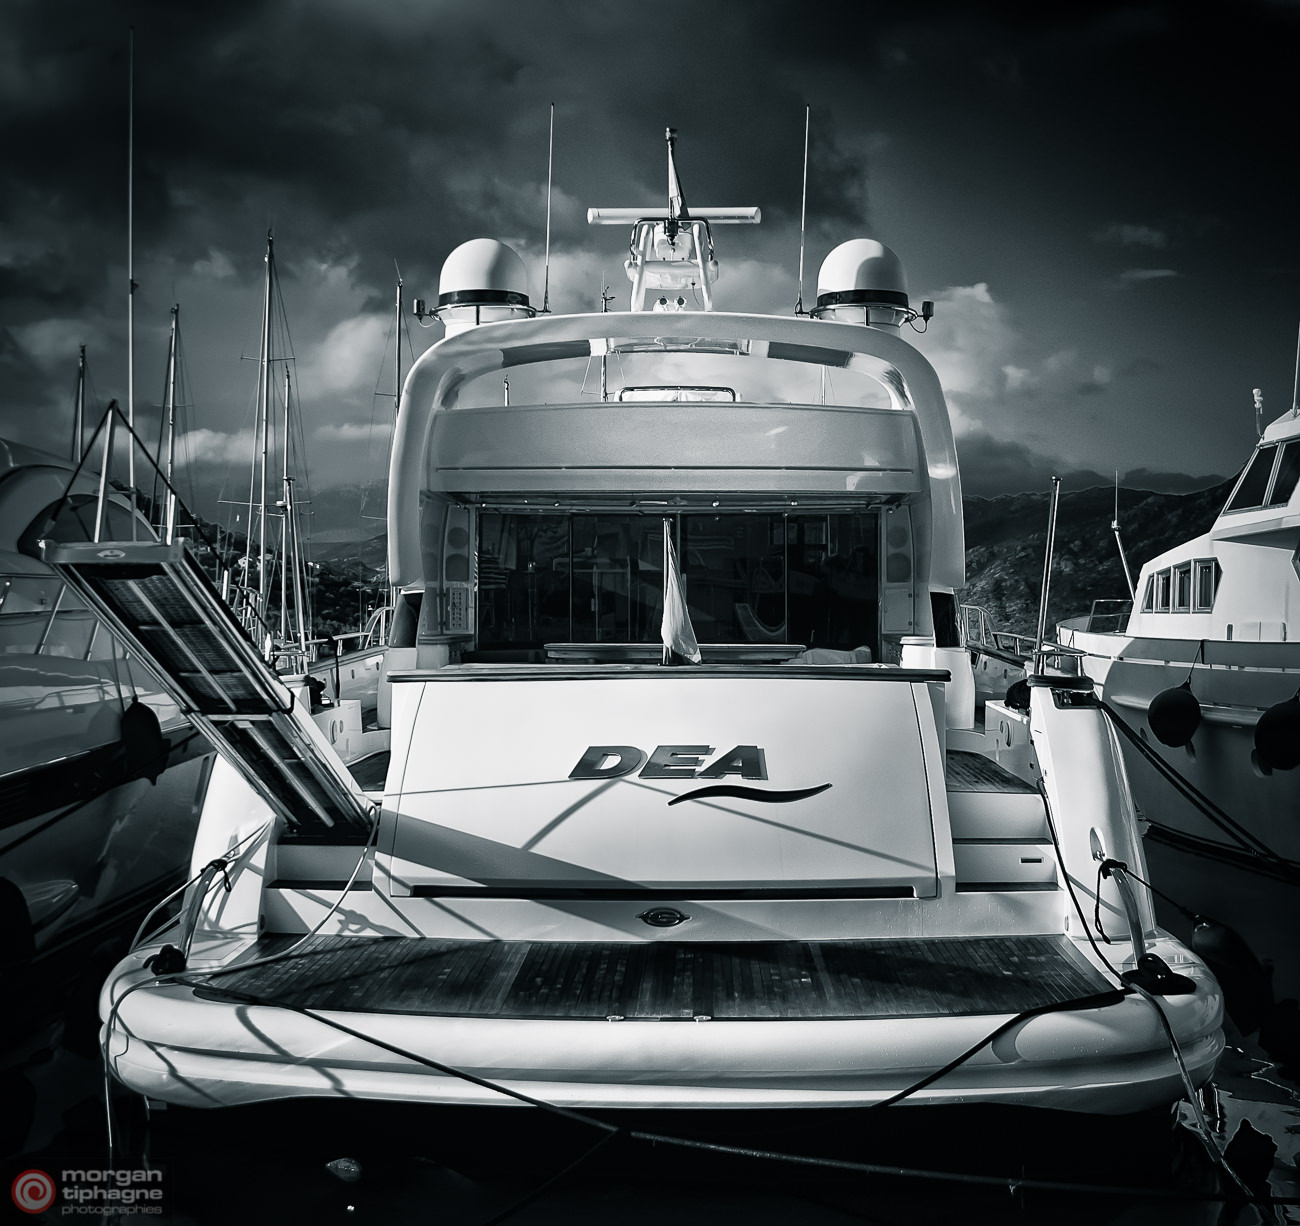 DEA boat